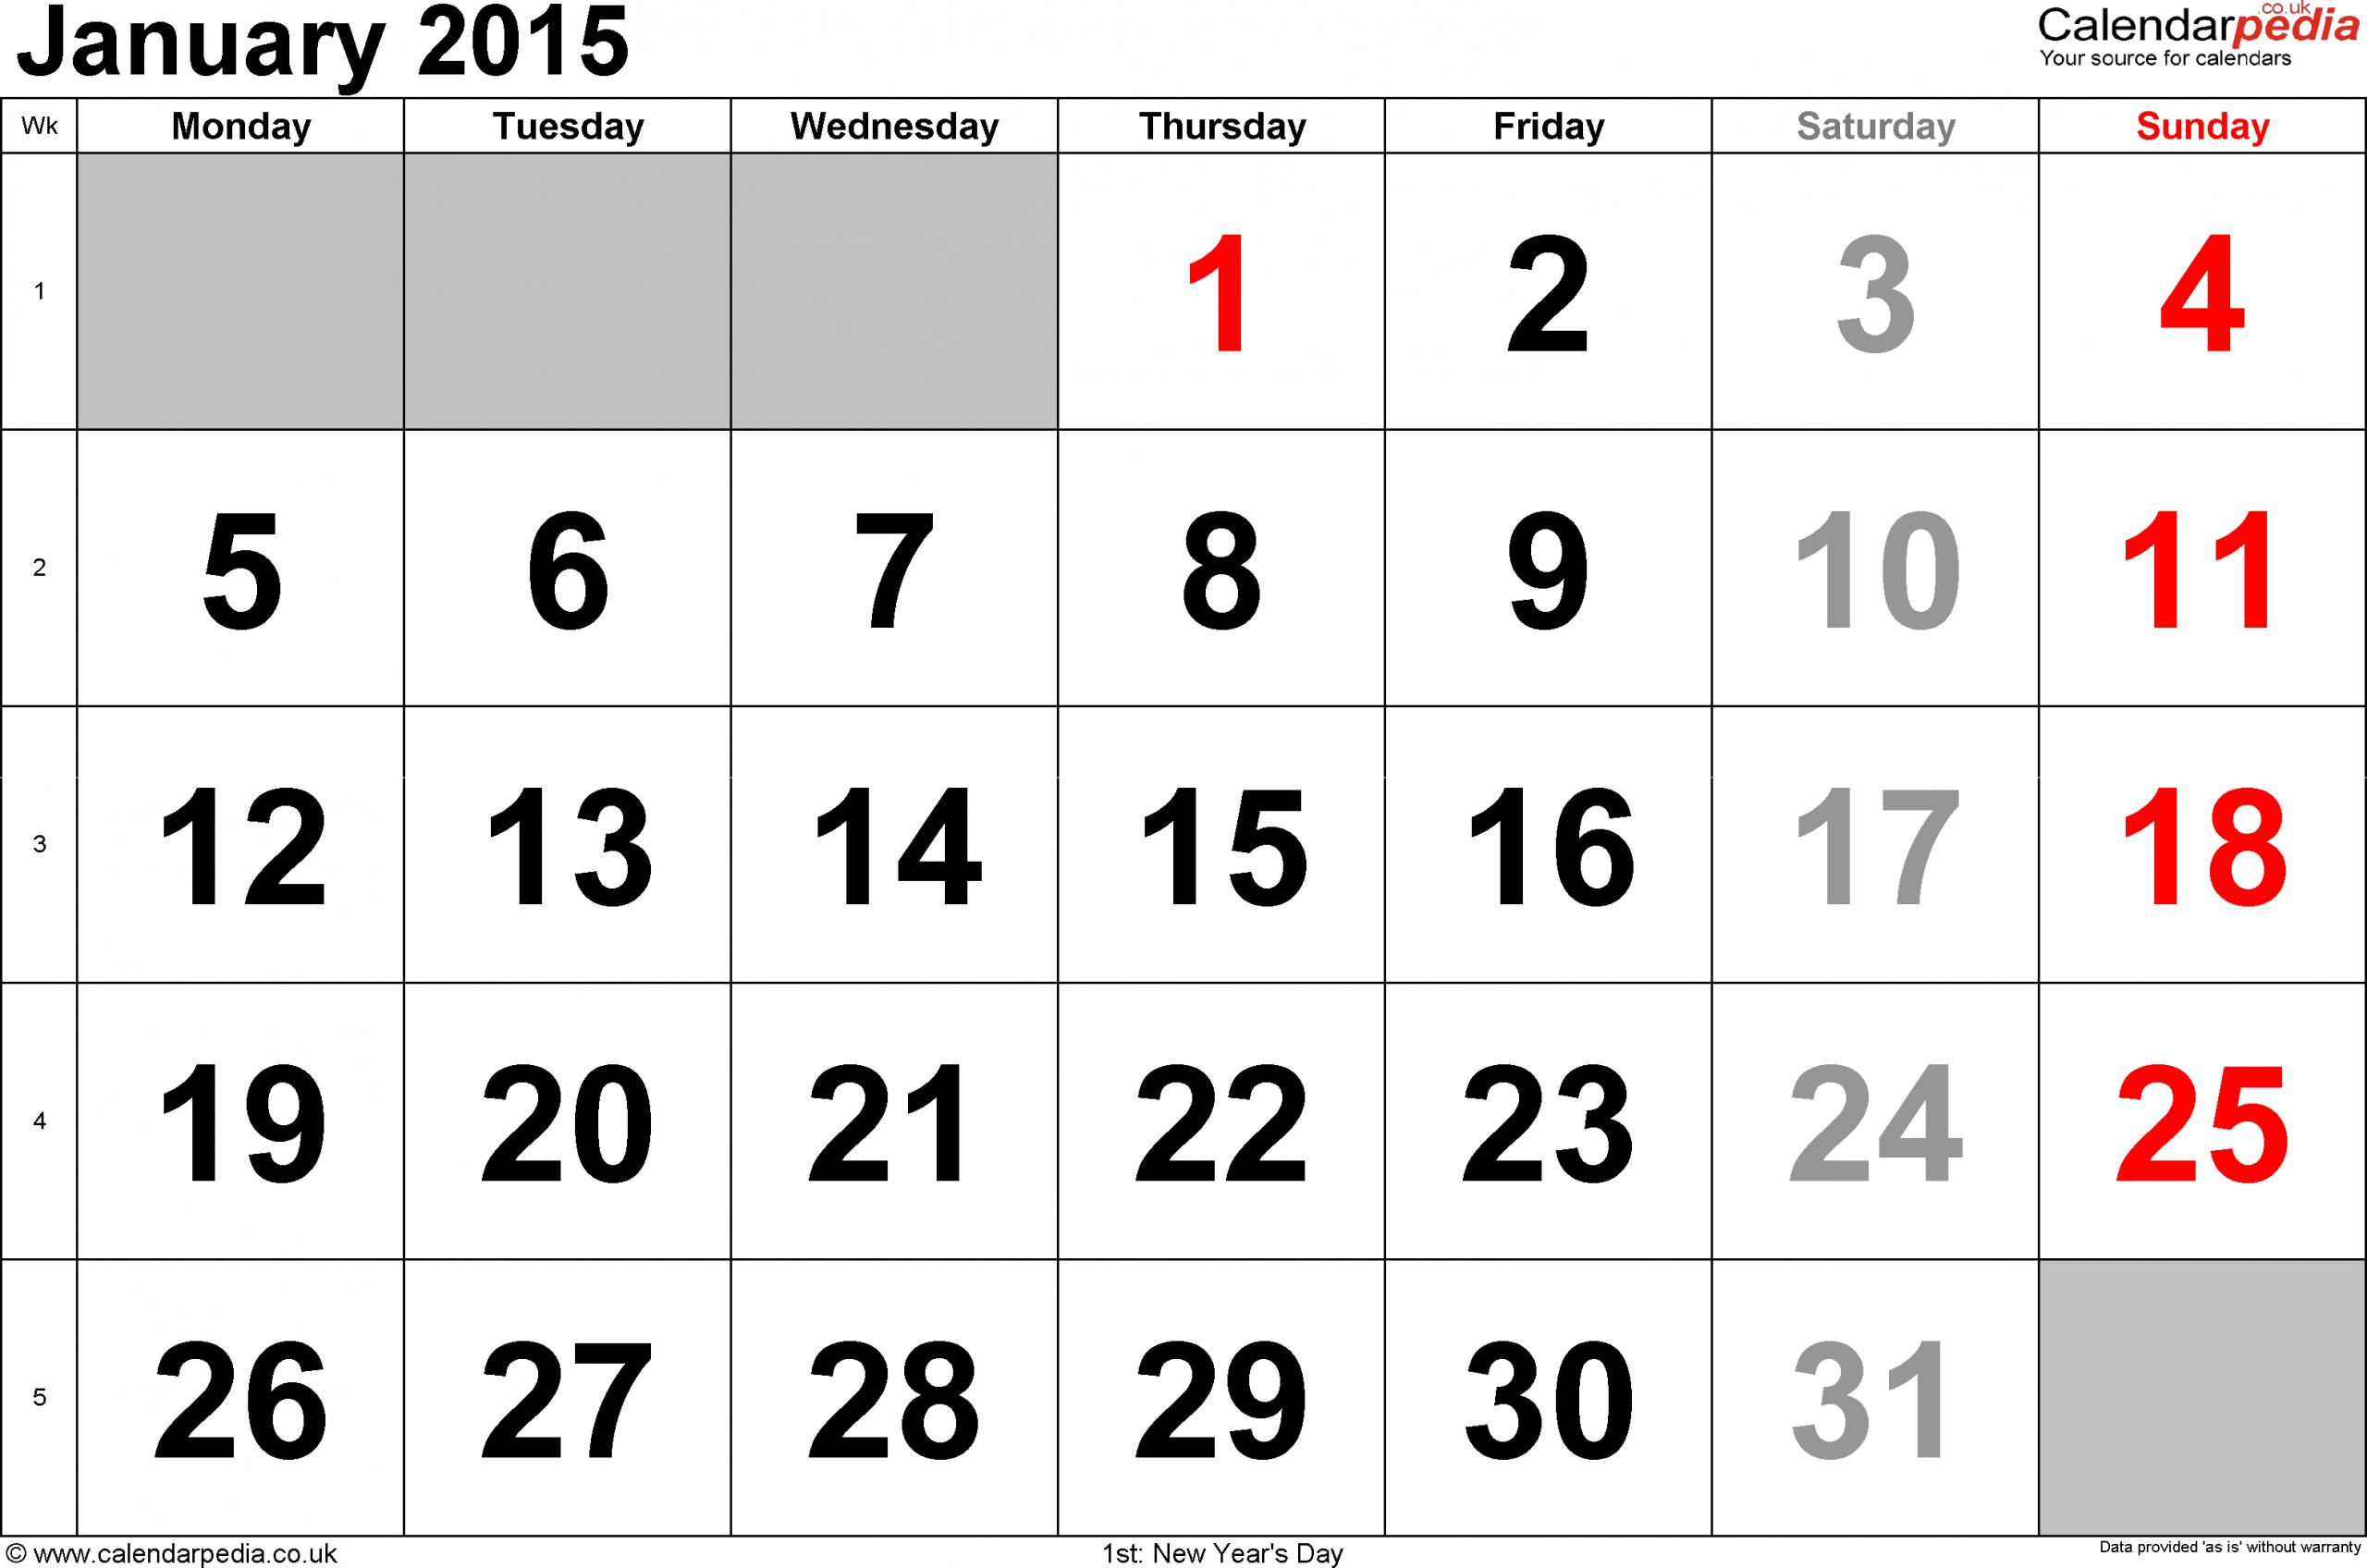 Calendar January 2015, Landscape Orientation, Large Numerals